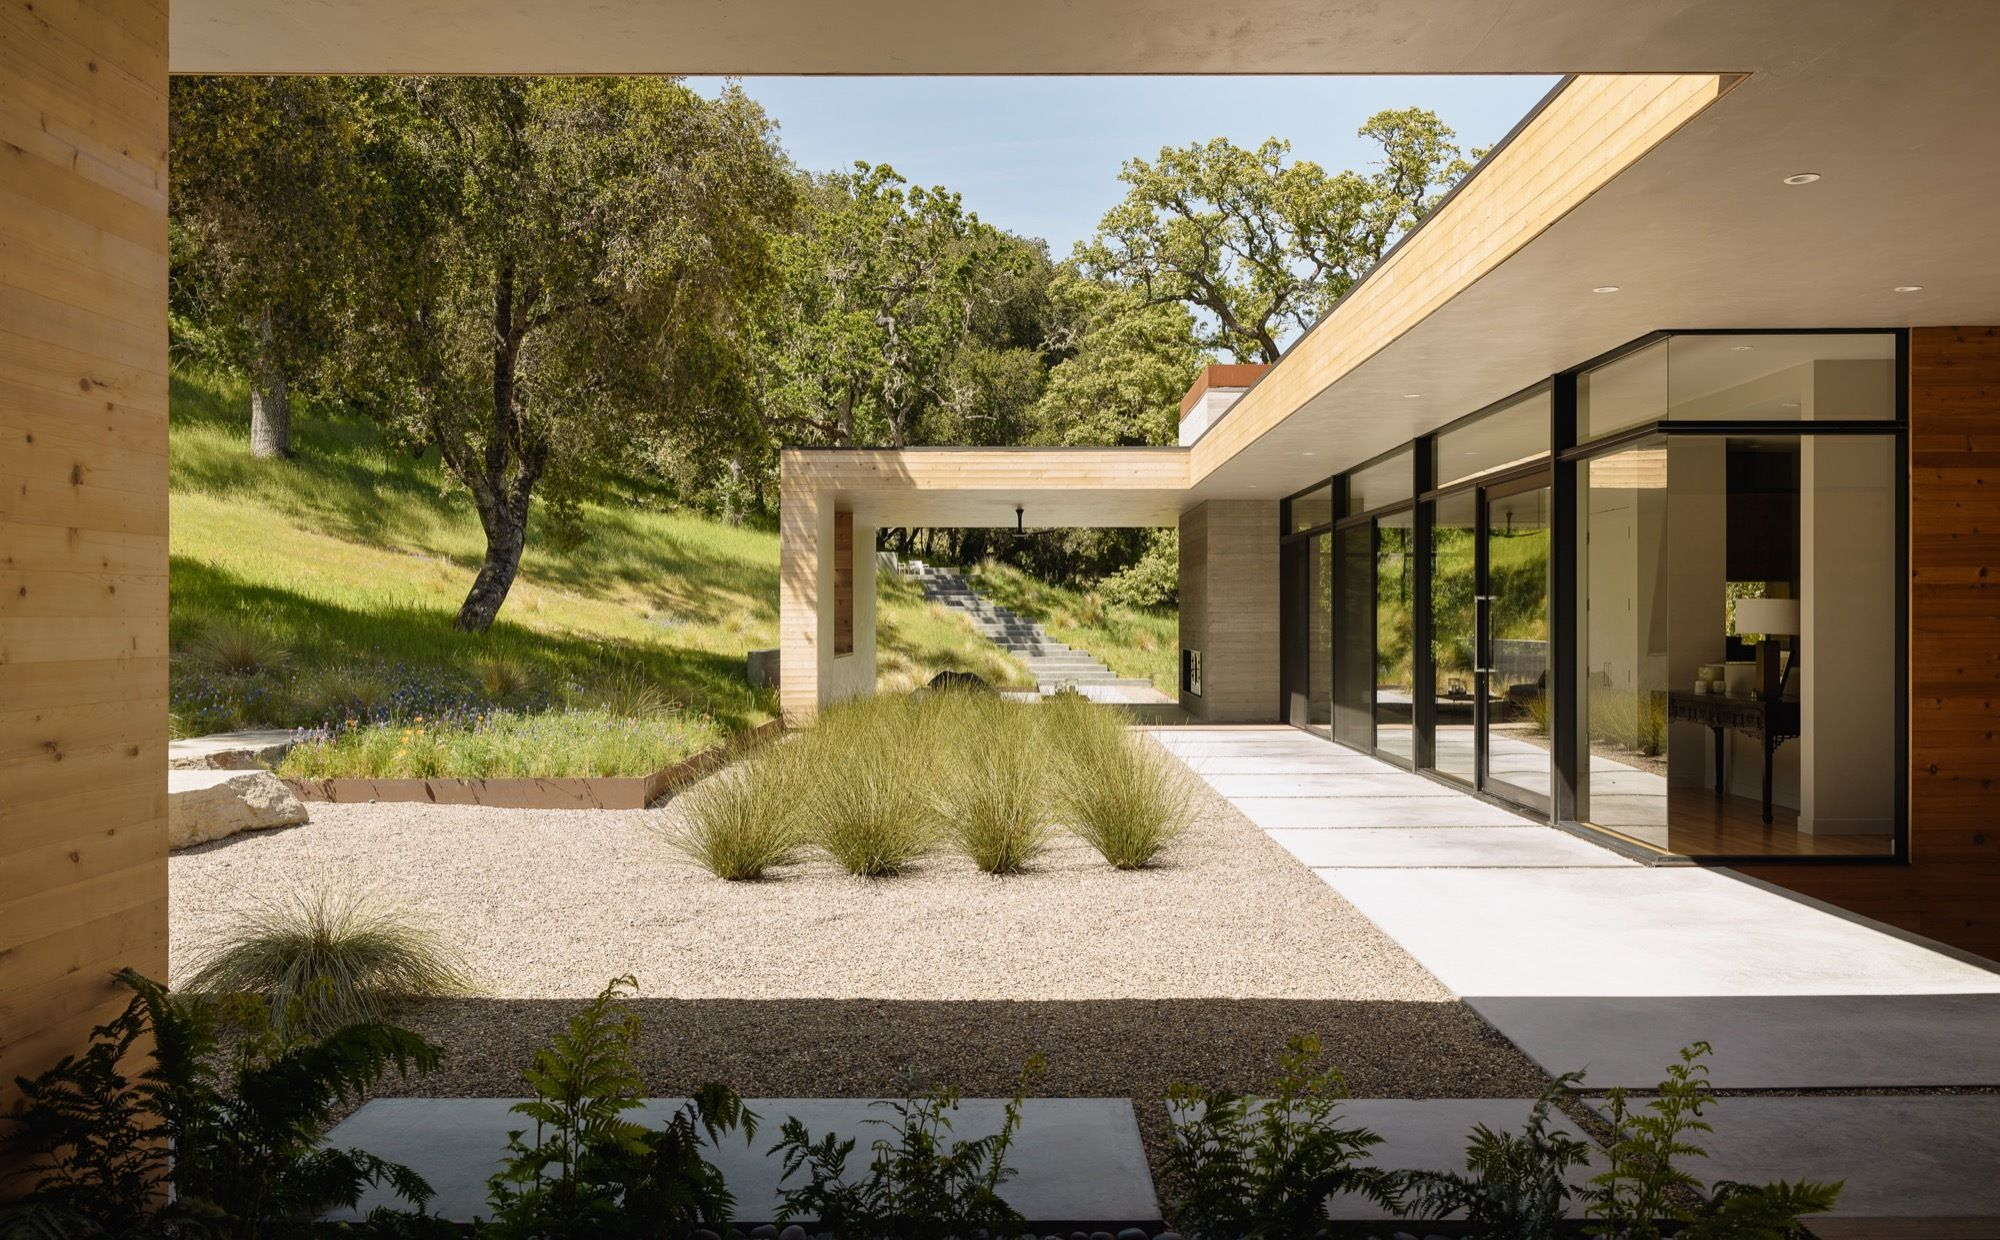 Carmel Valley Residence / Sagan Piechota Architecture | Architecture